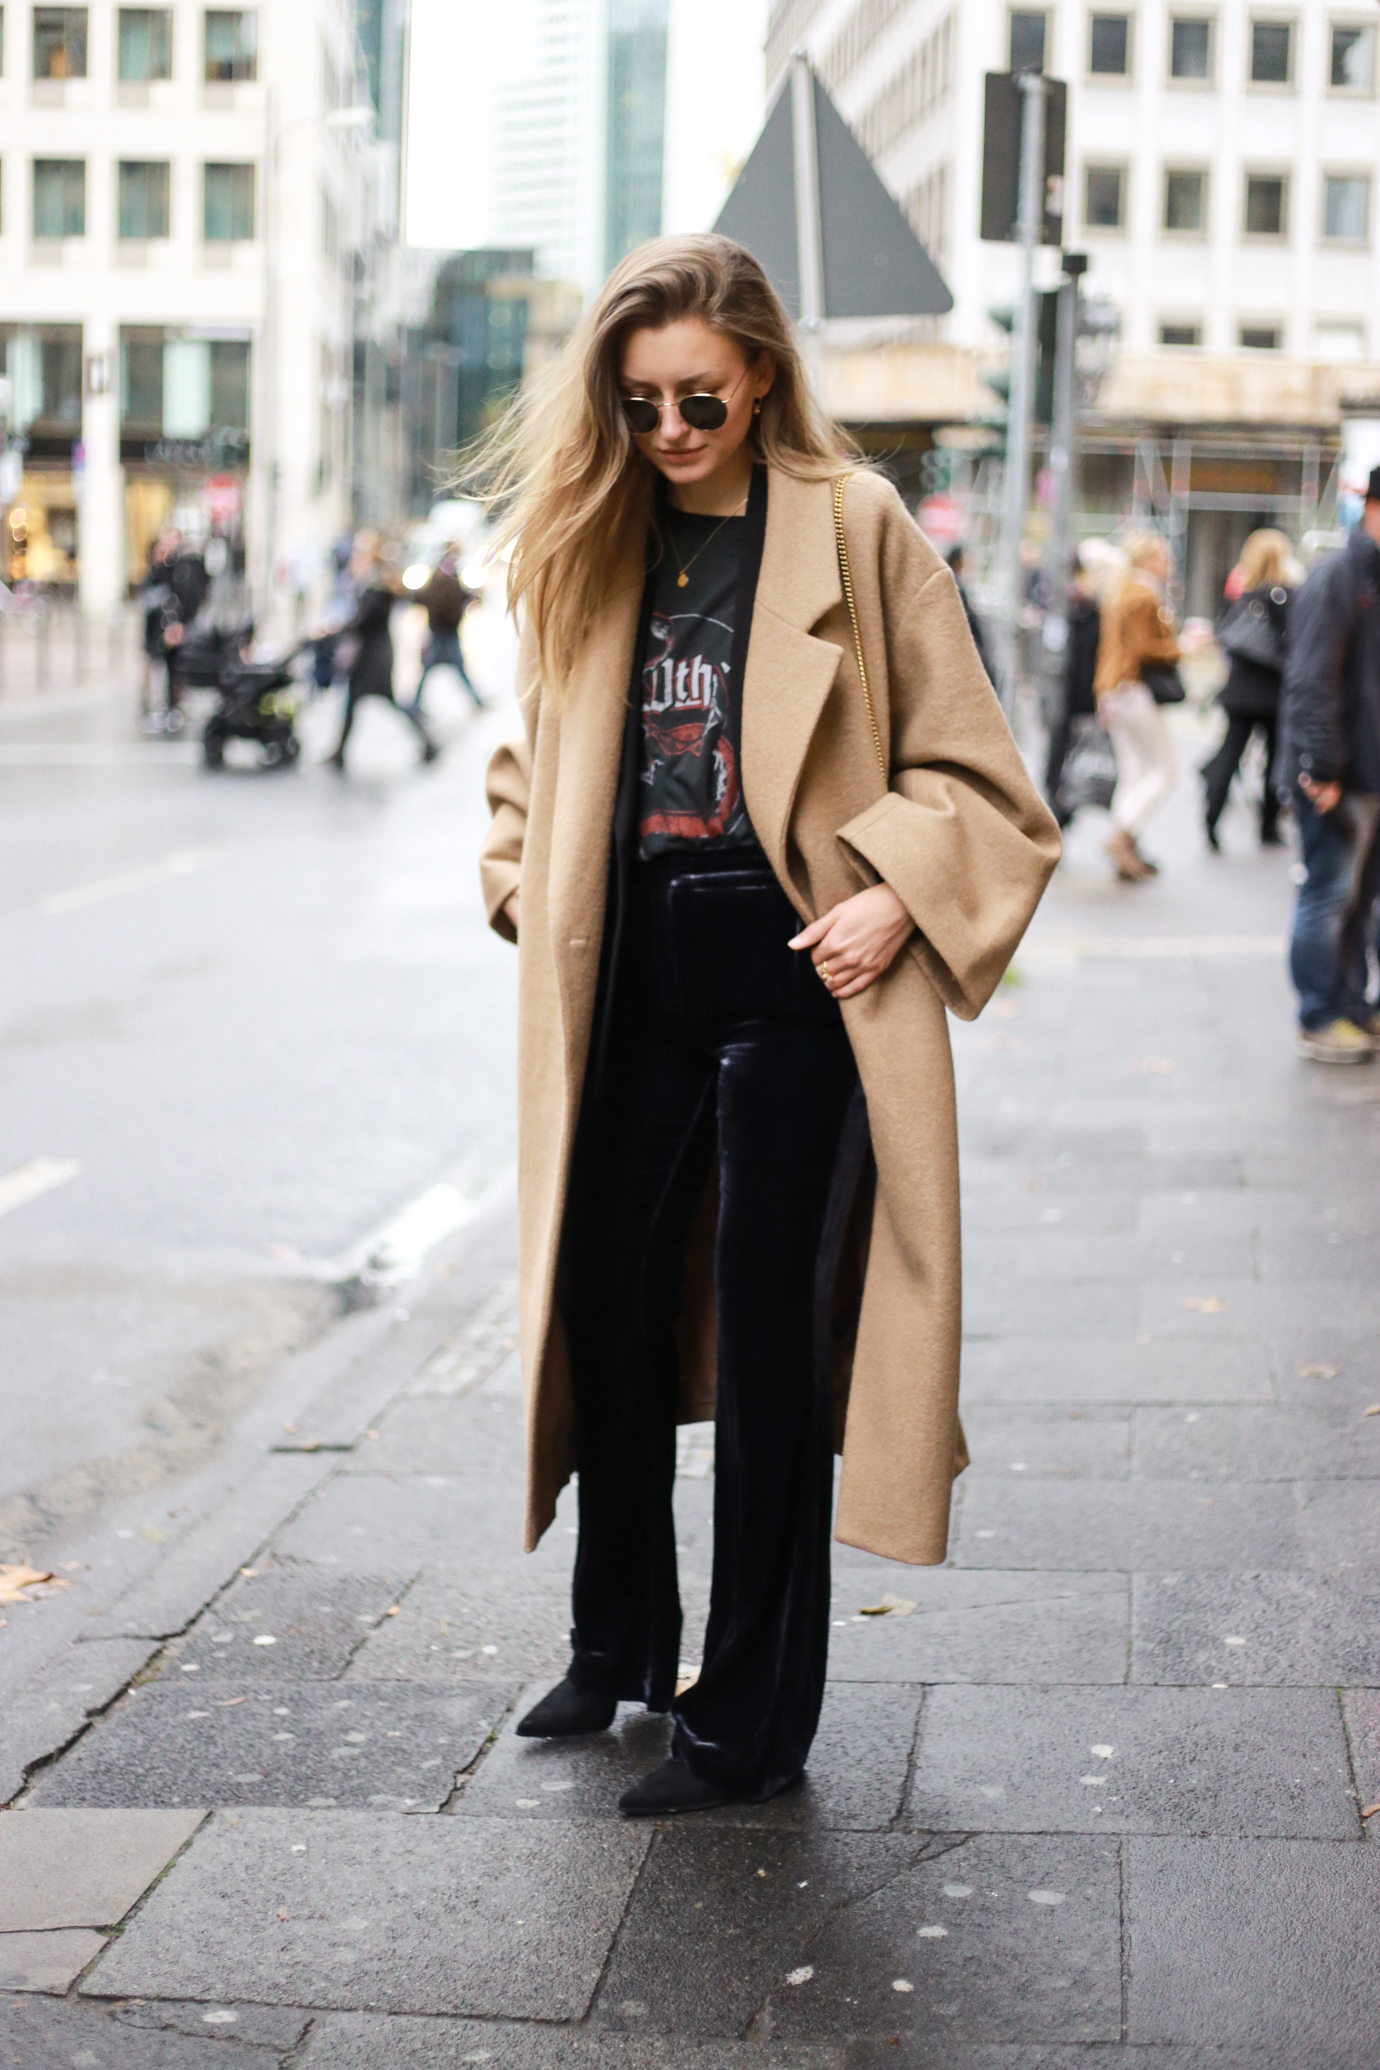 velvet-band-shirt-camel-coat-outfit-livia-auer-6515